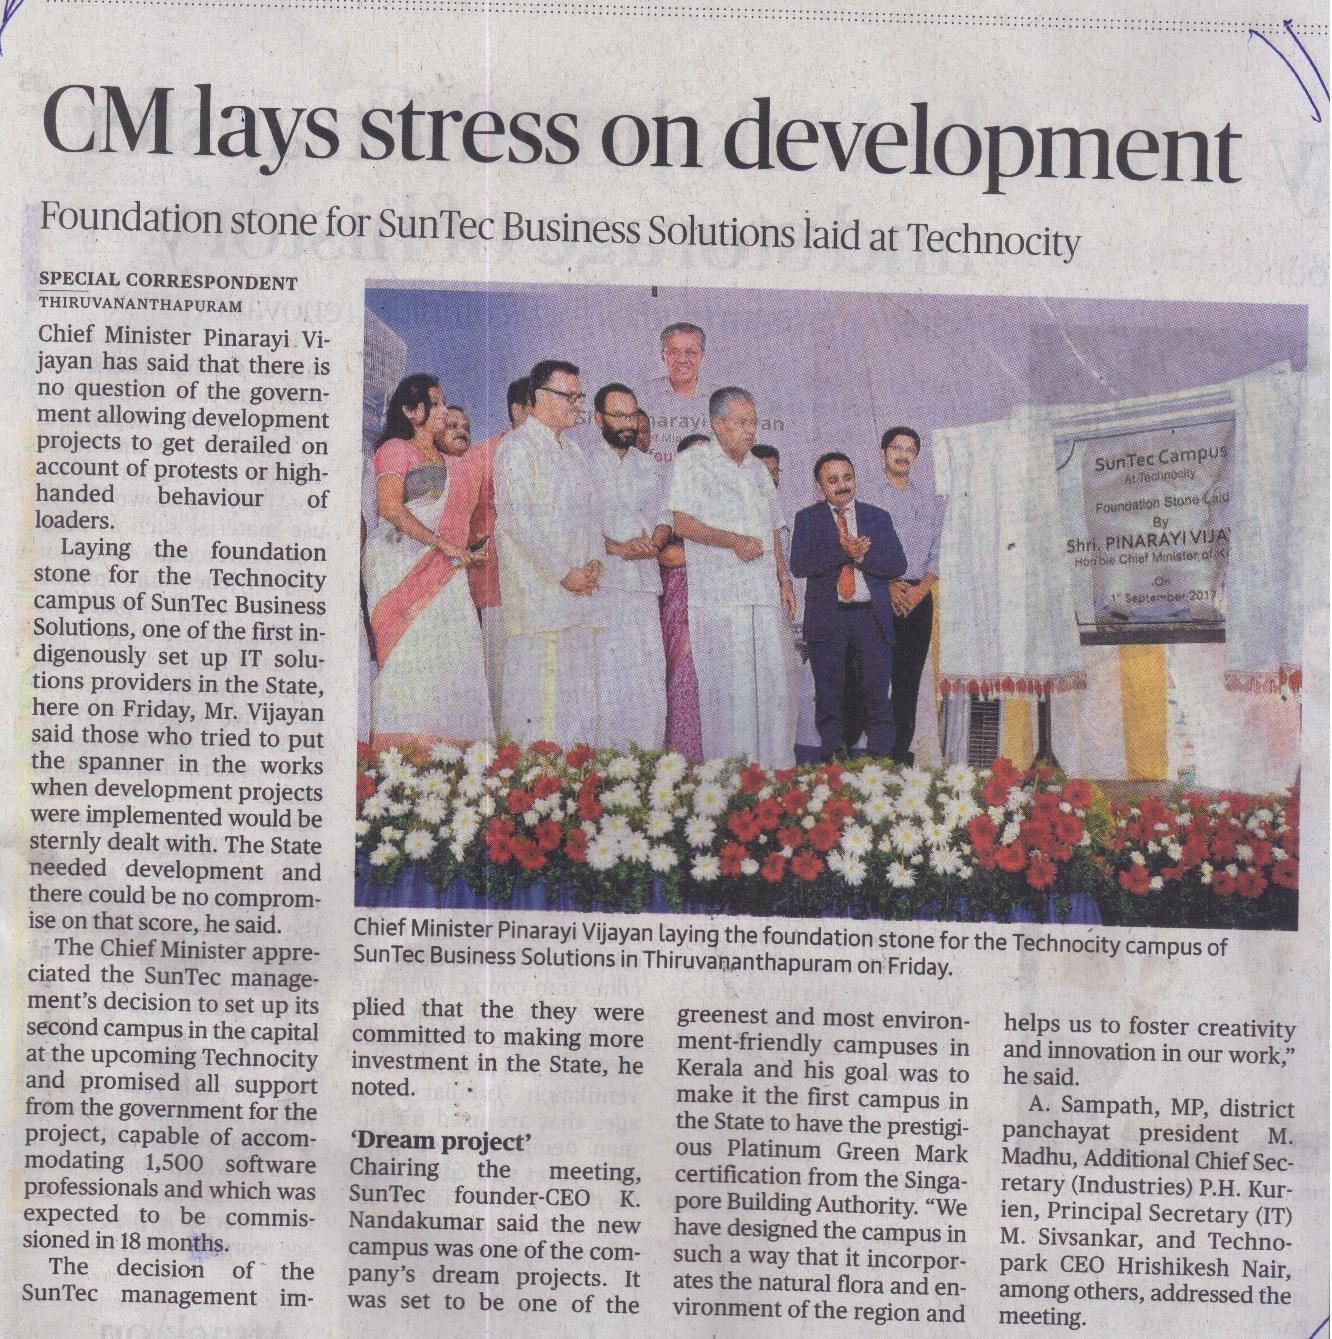 CM lays stress on development